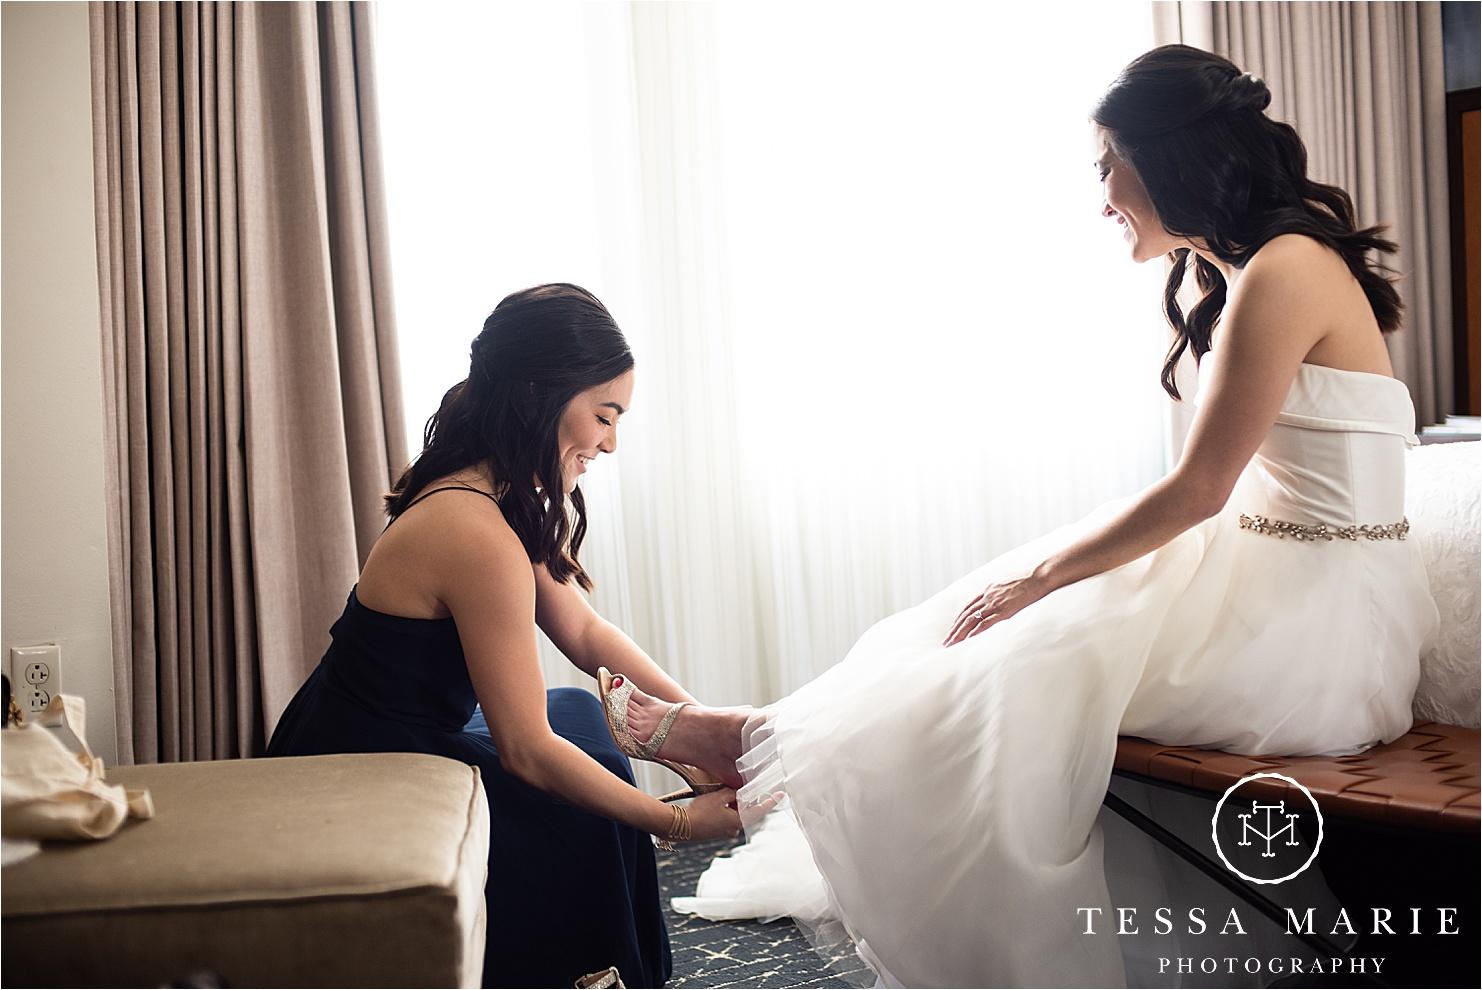 Tessa_marie_weddings_houston_wedding_photographer_The_astorian_0020.jpg